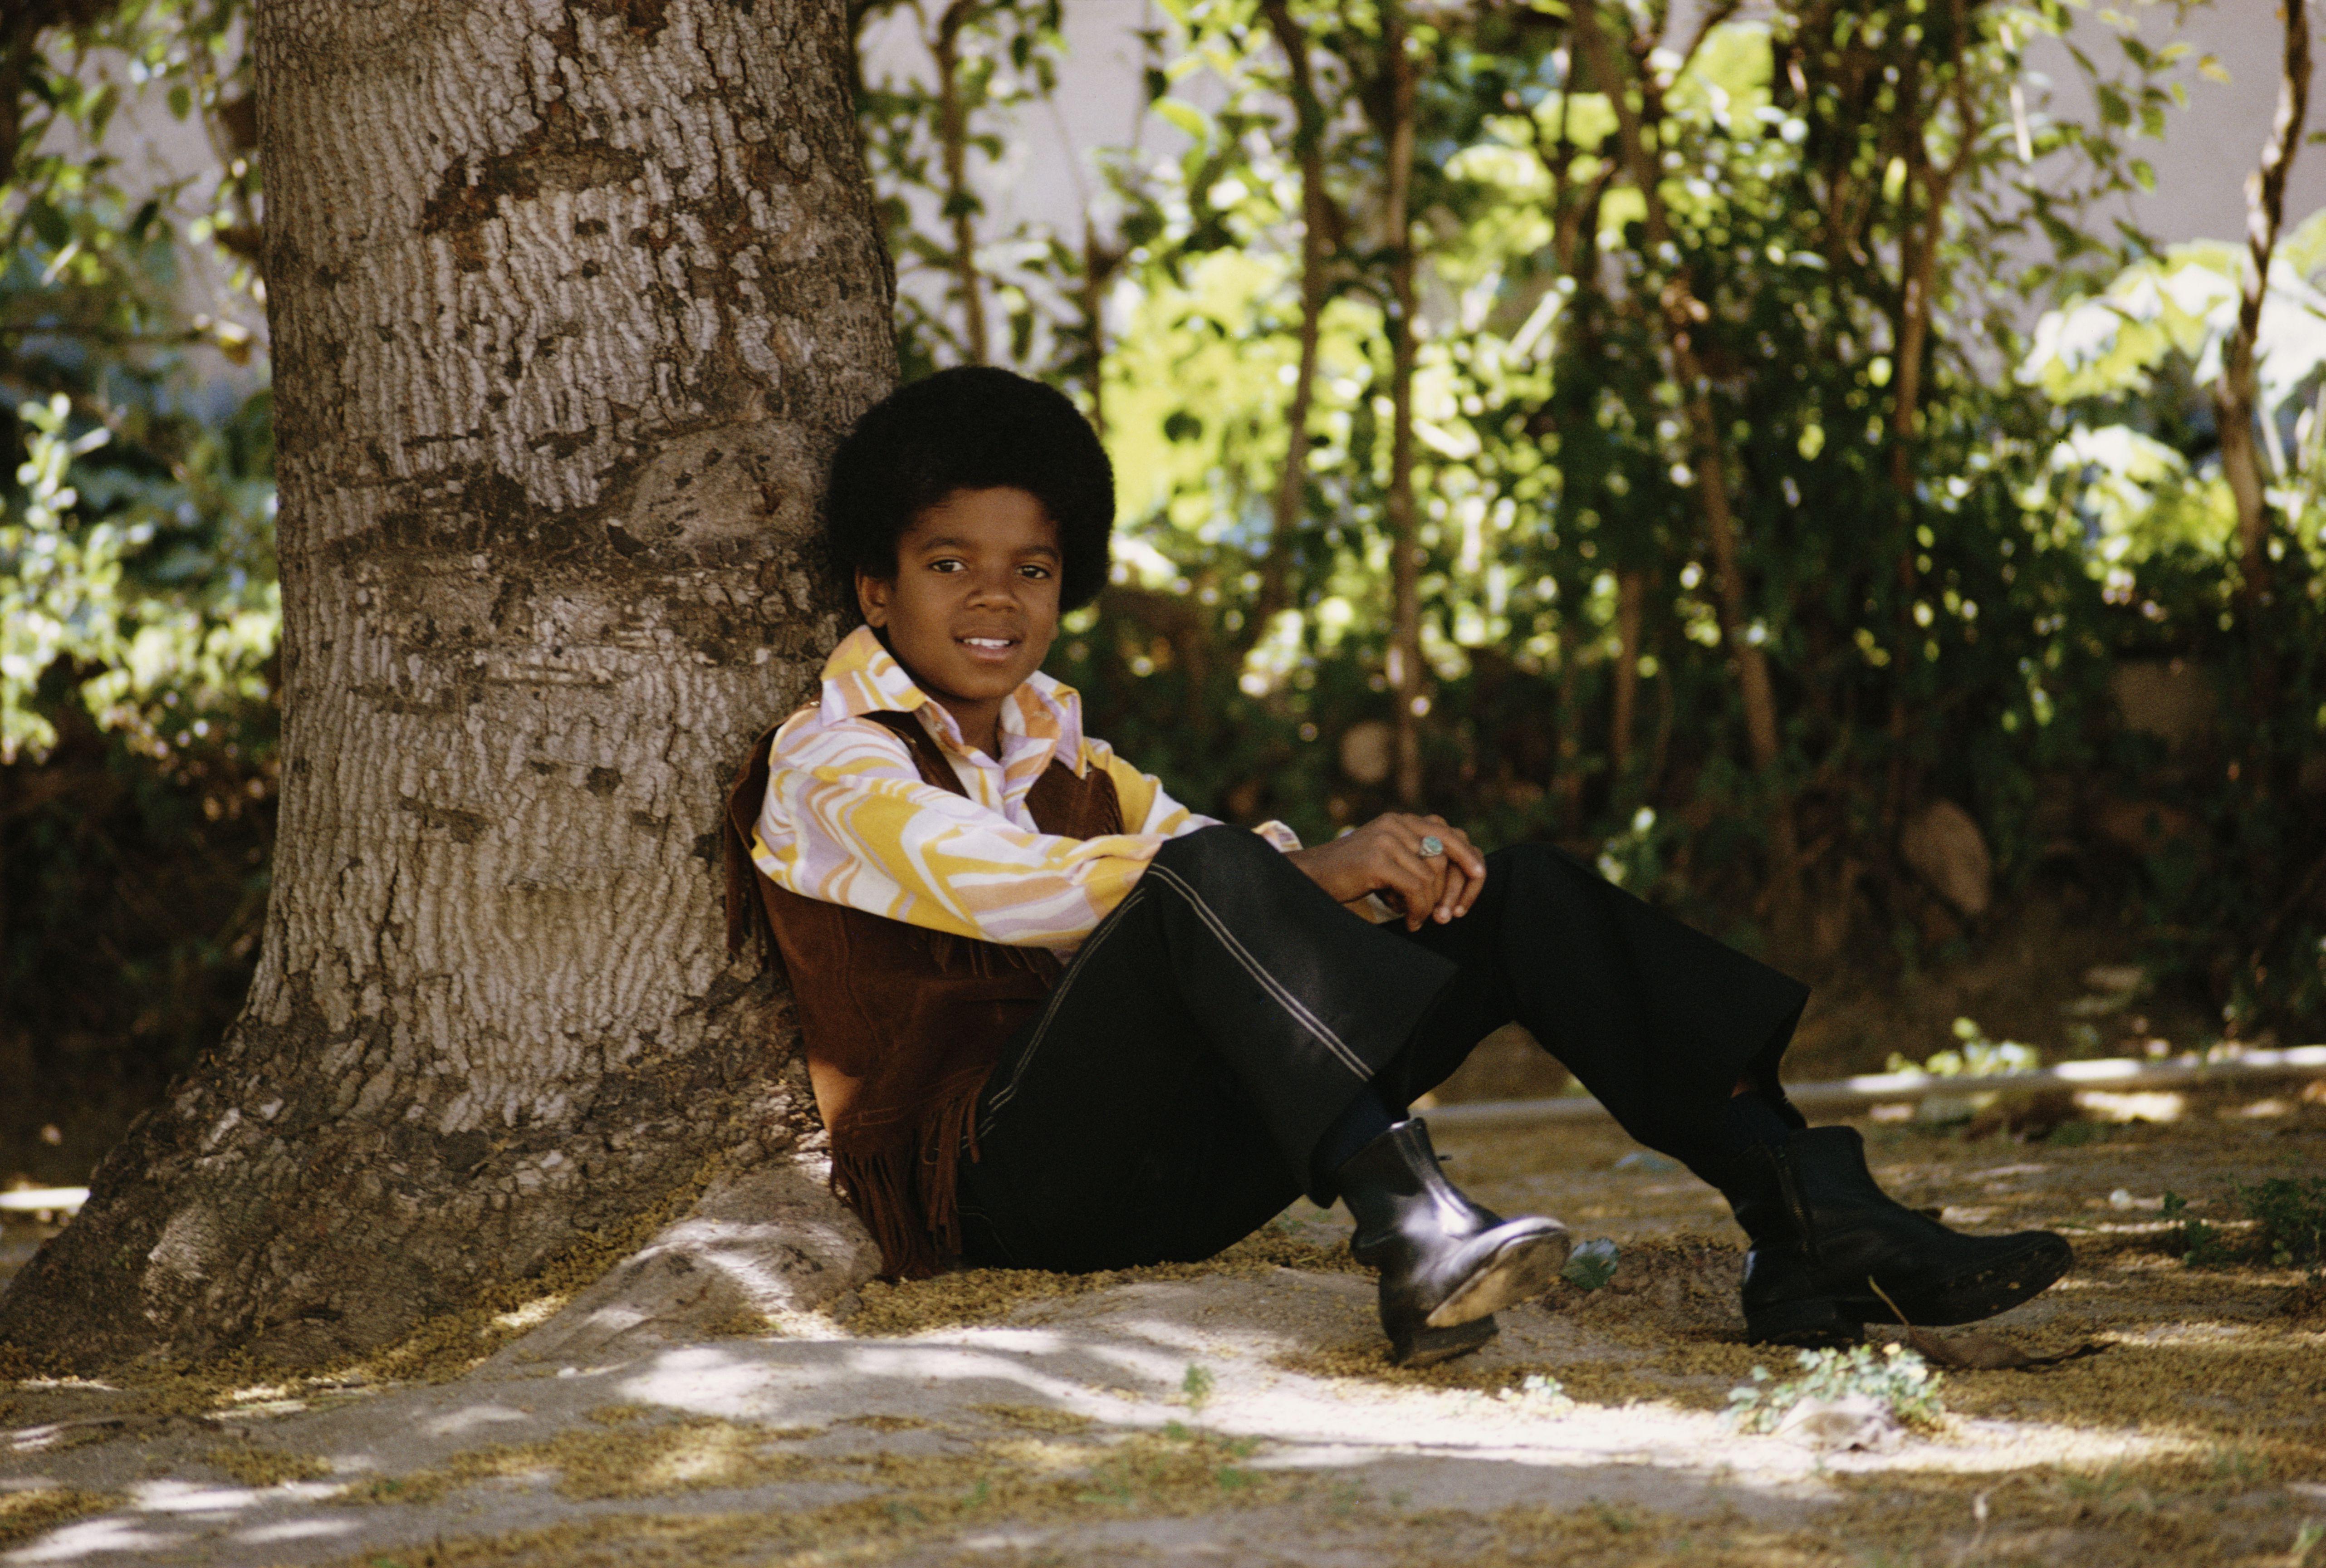 Michael Jackson as child